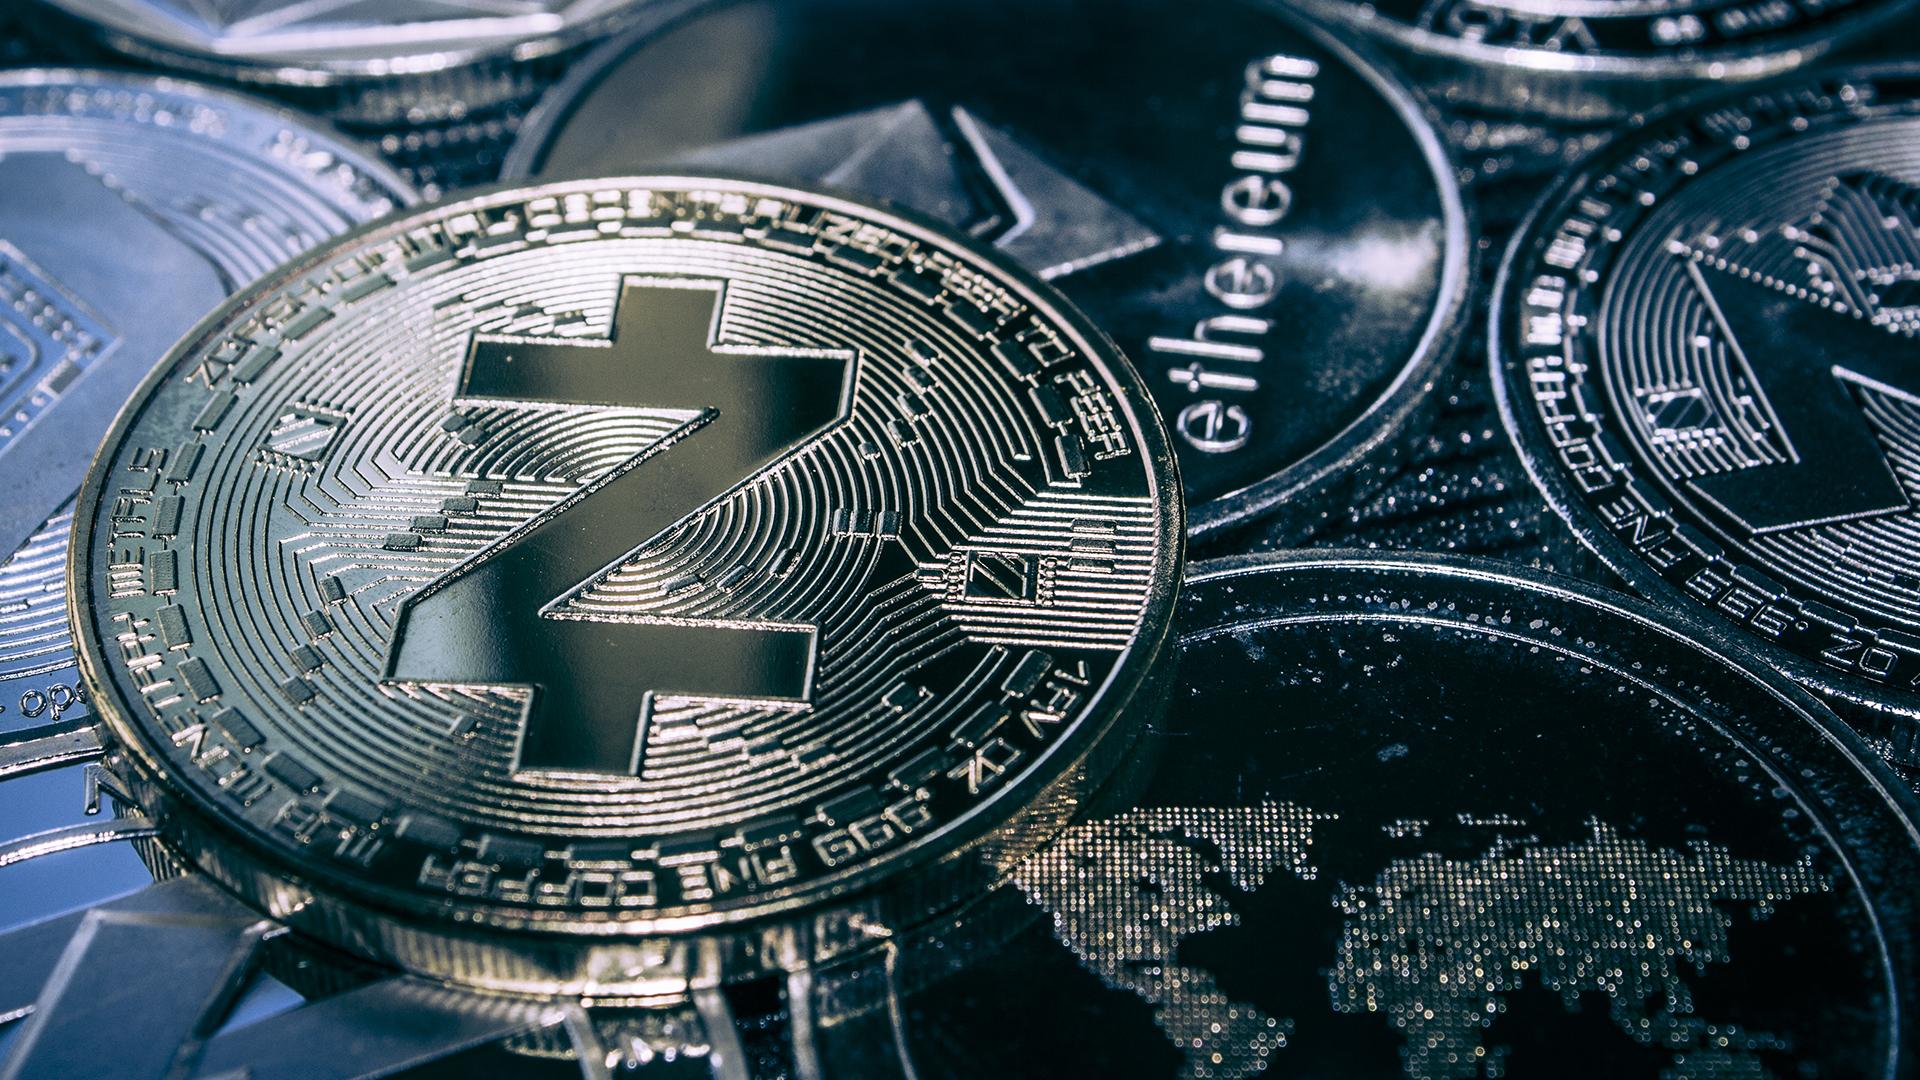 Zcash's halo development a breakthrough for decentralized finance 2